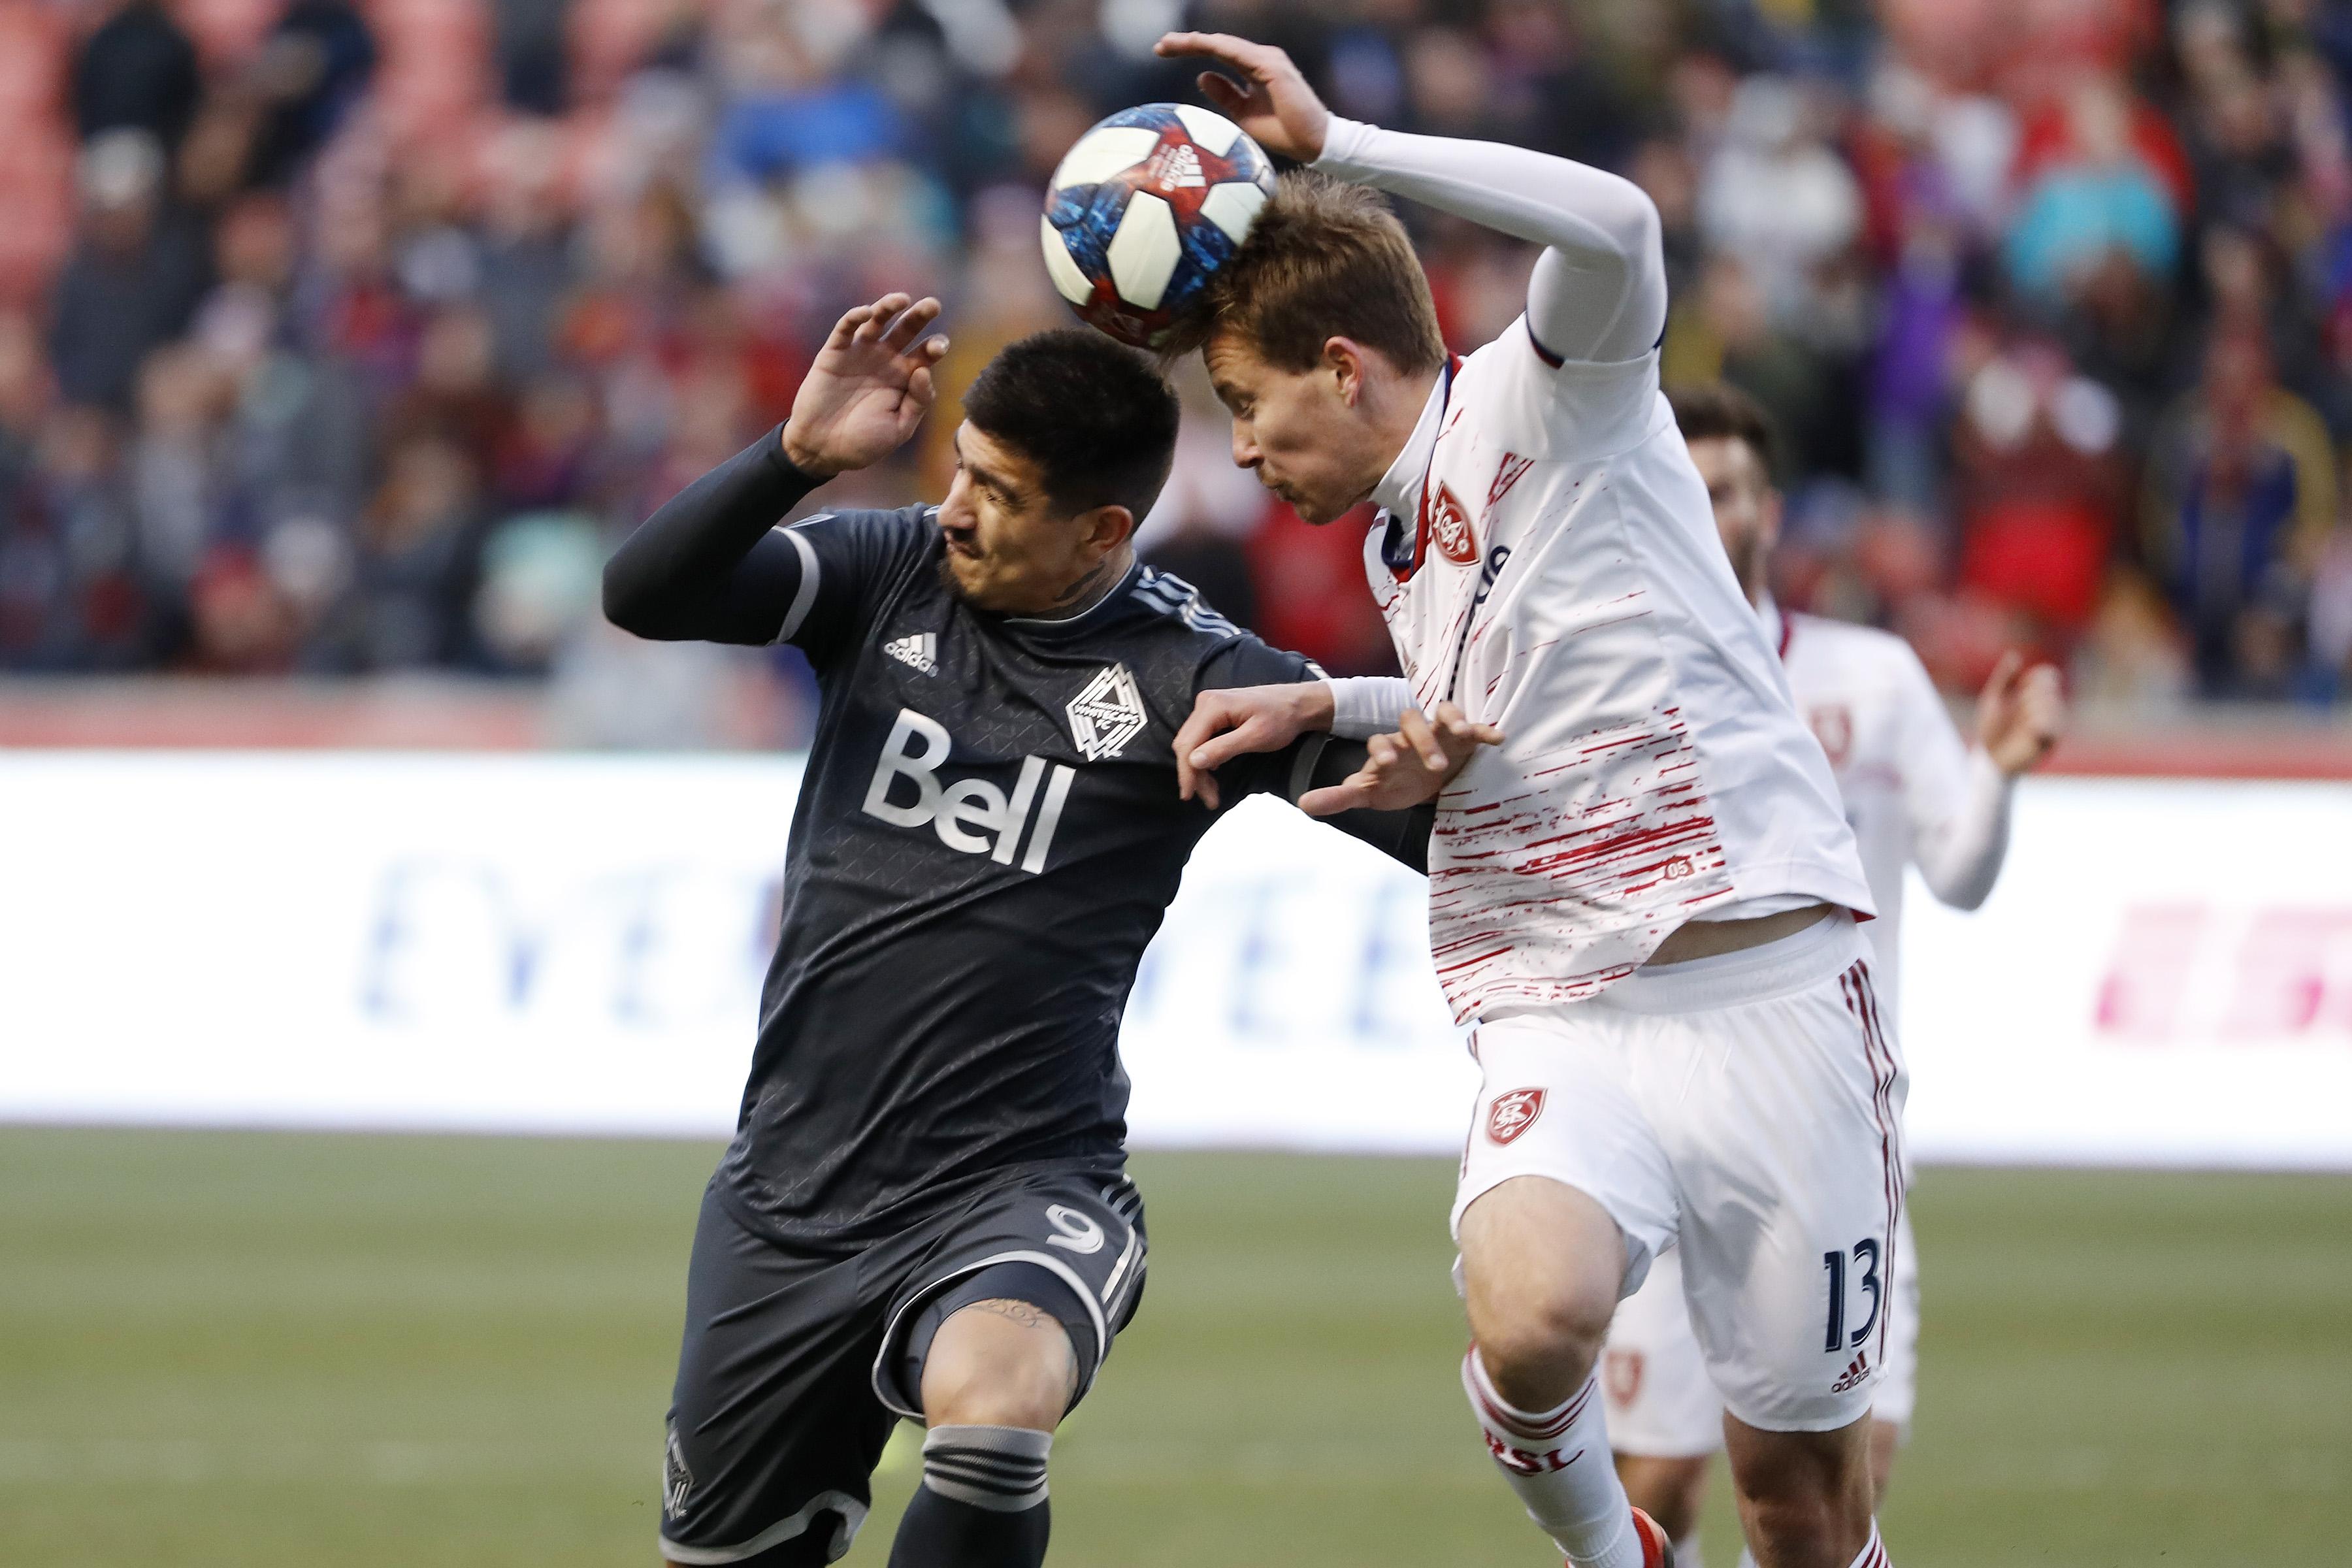 MLS: Vancouver Whitecaps FC at Real Salt Lake